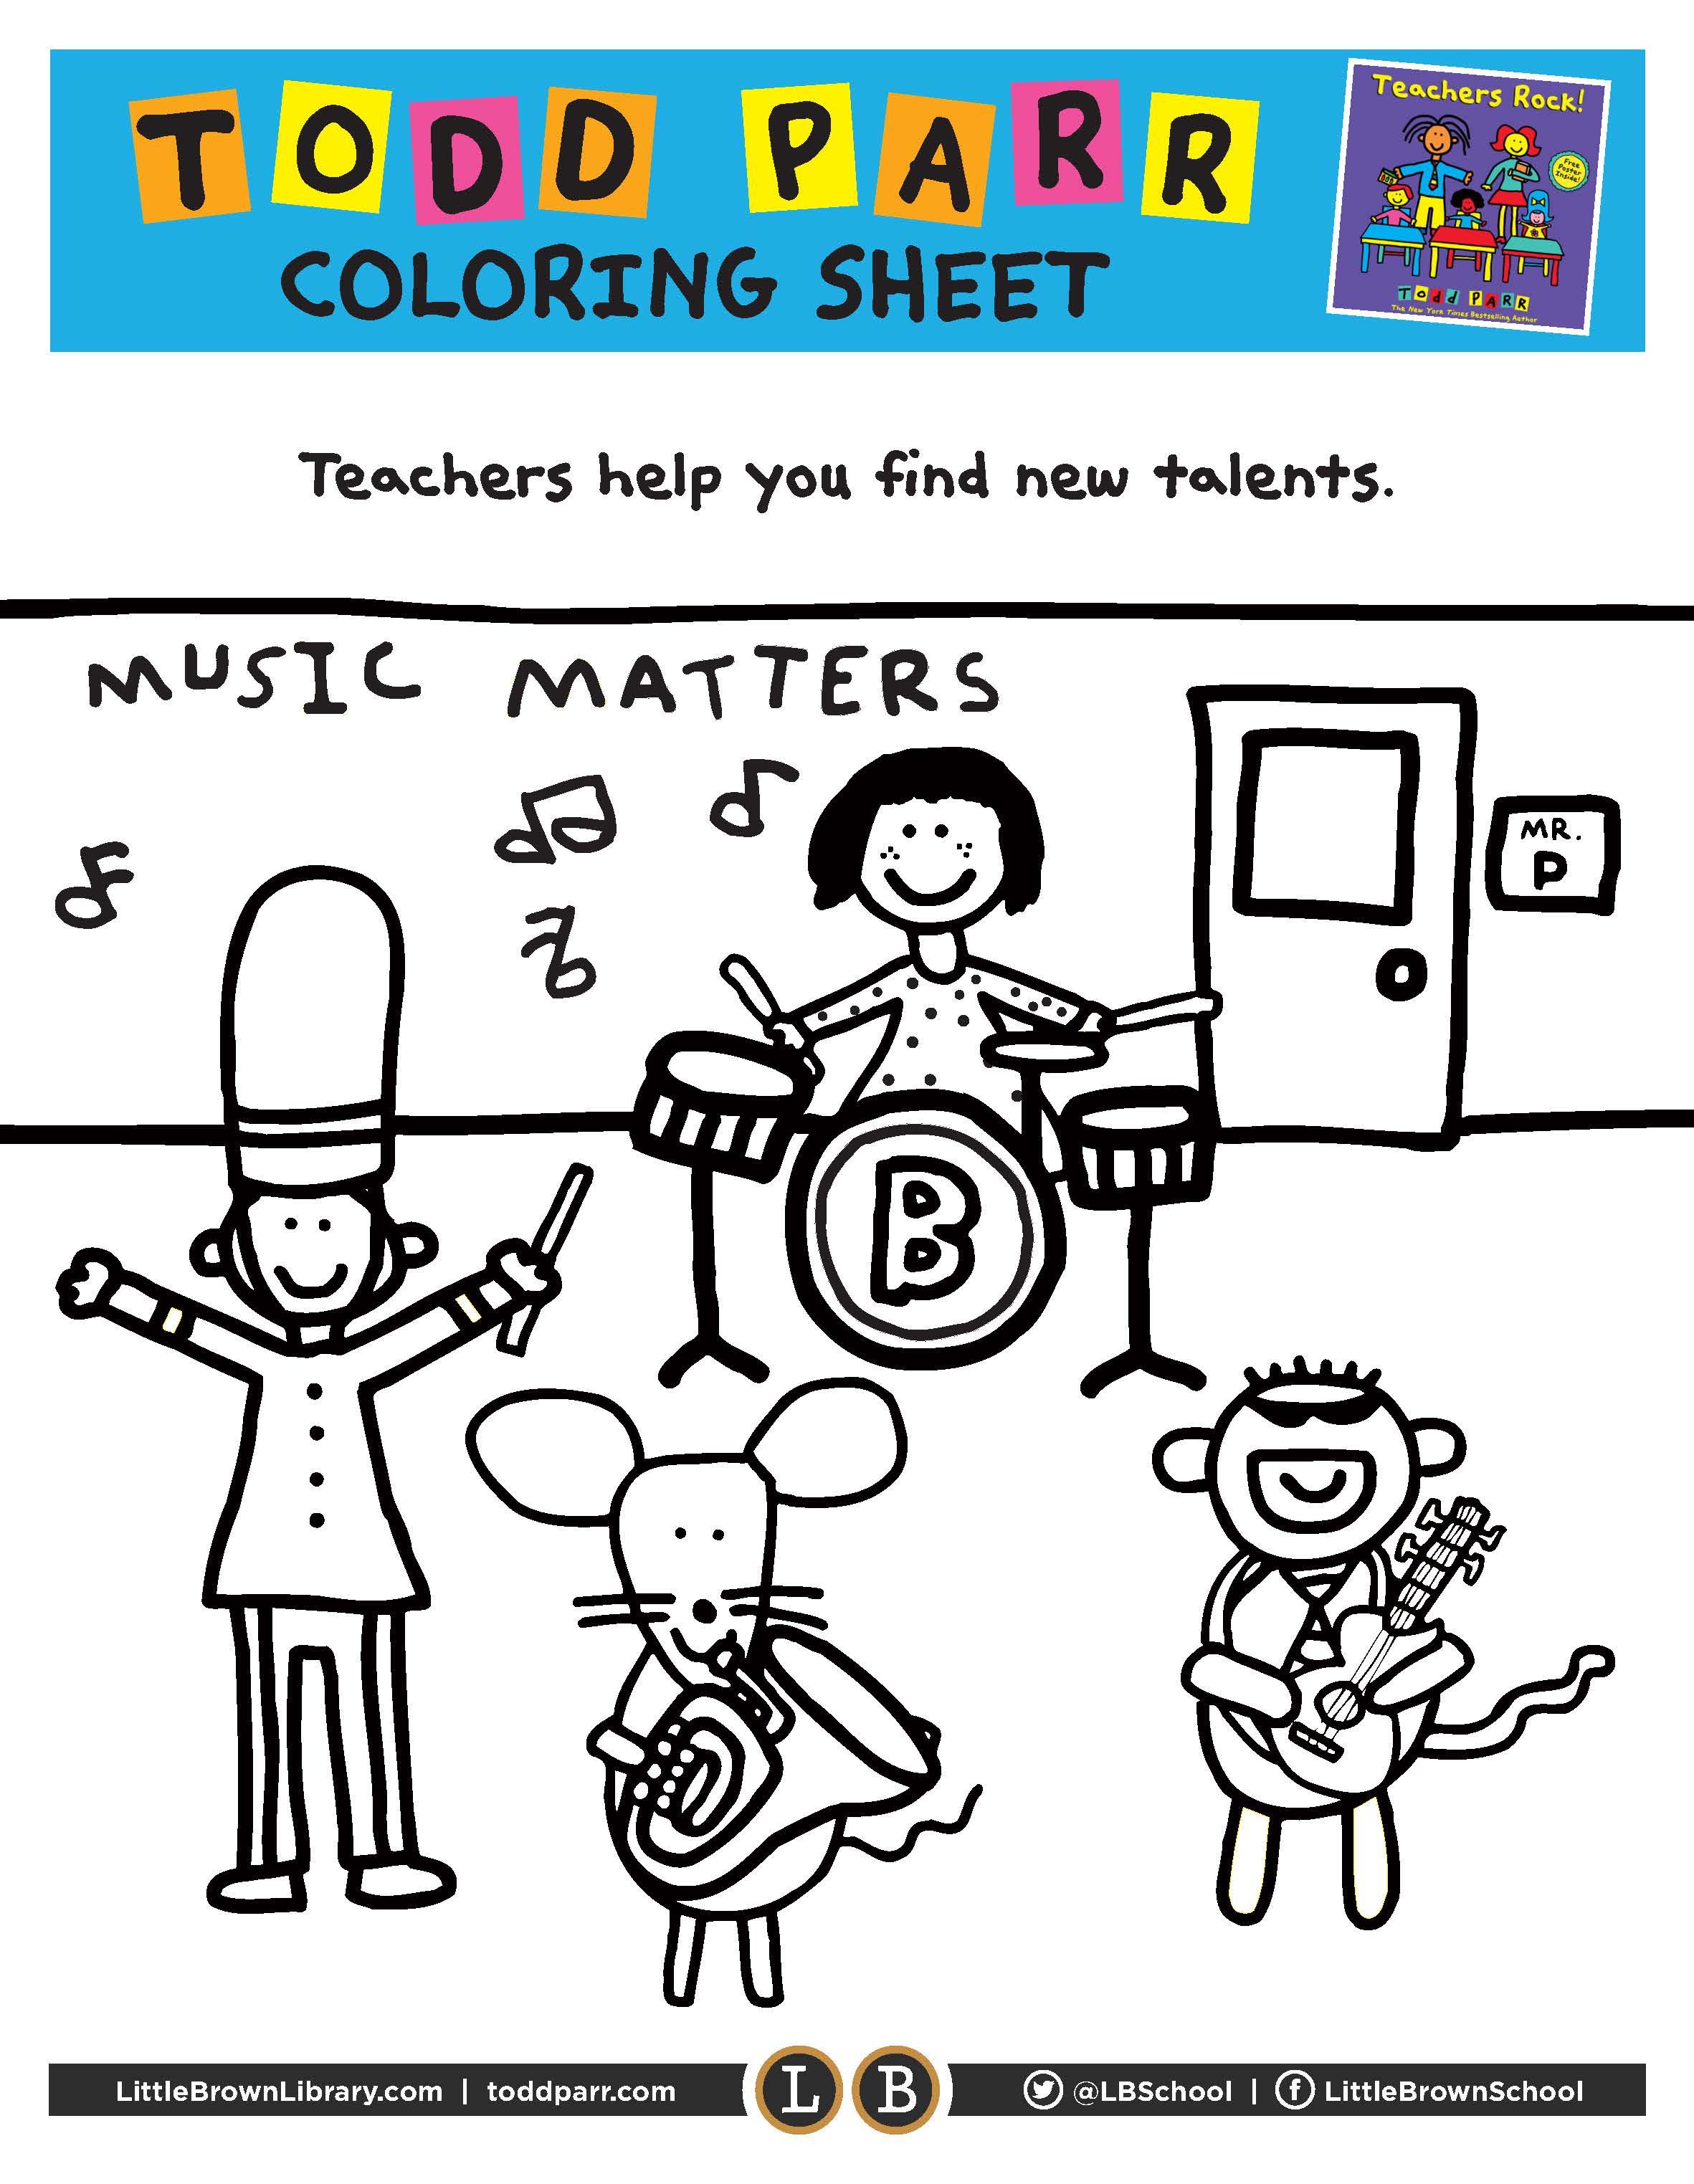 Teachers Rock Coloring Pages